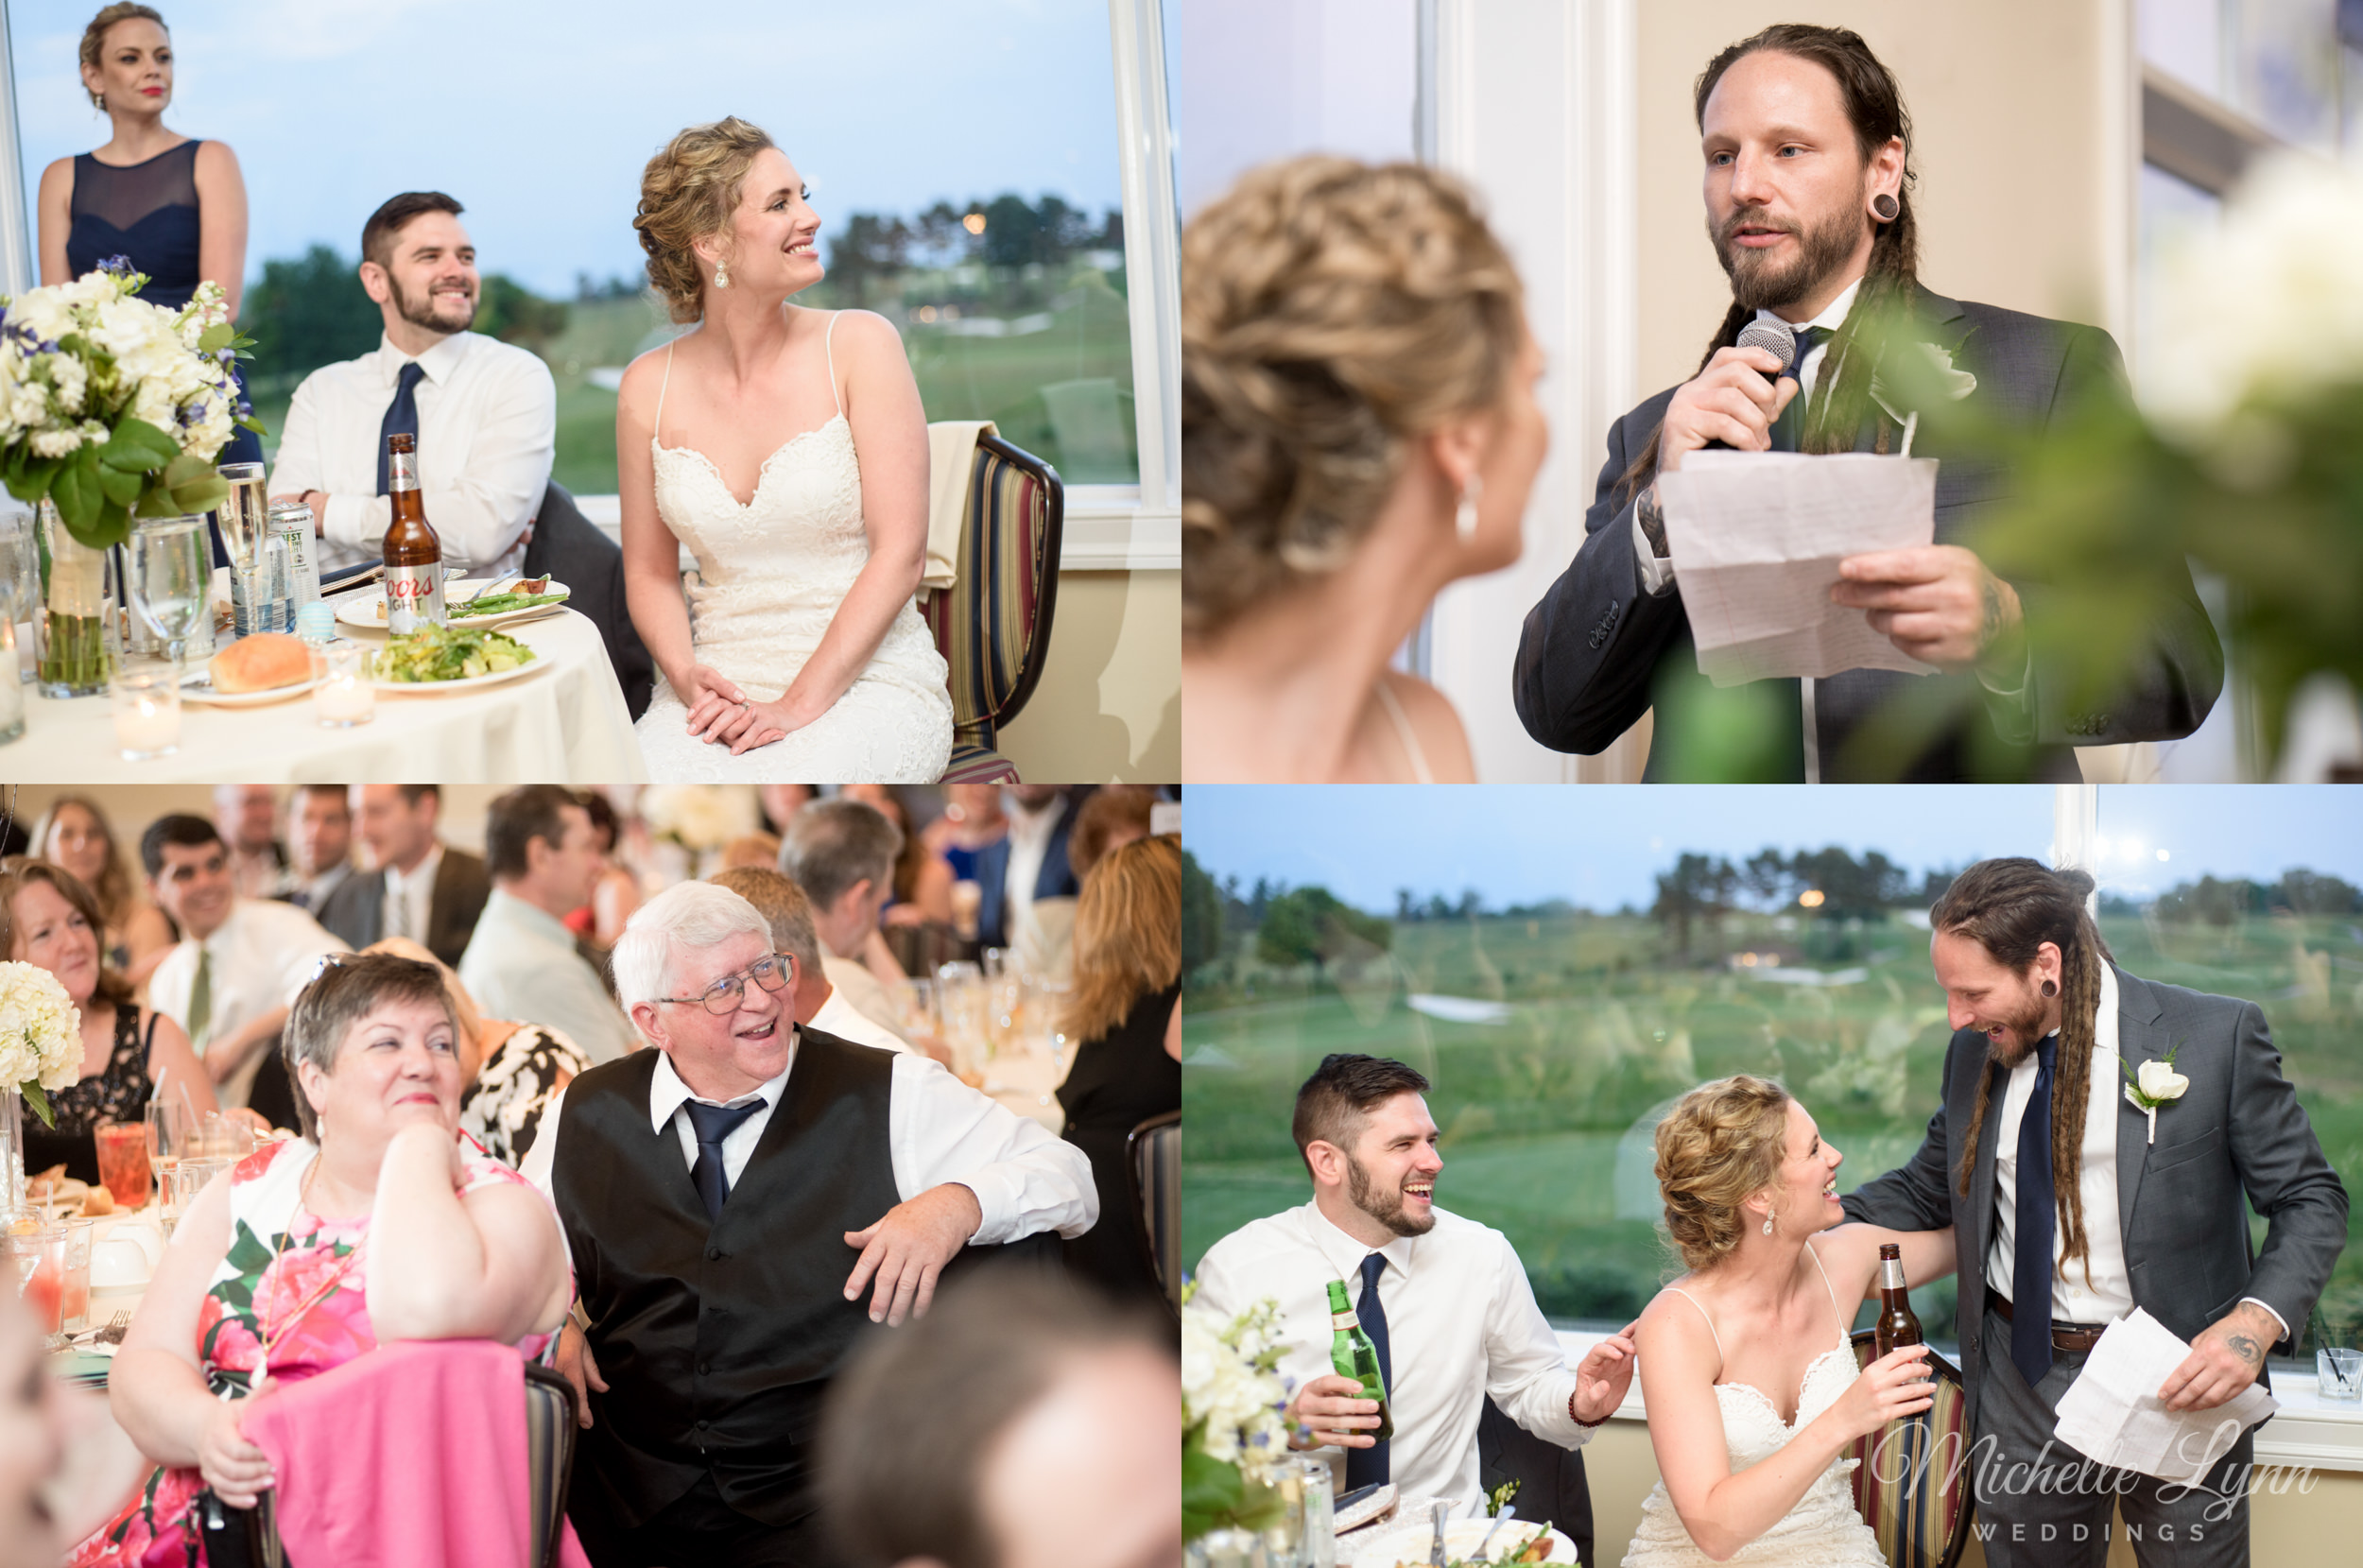 mlw-jericho-national-golf-club-wedding-photography-60.jpg